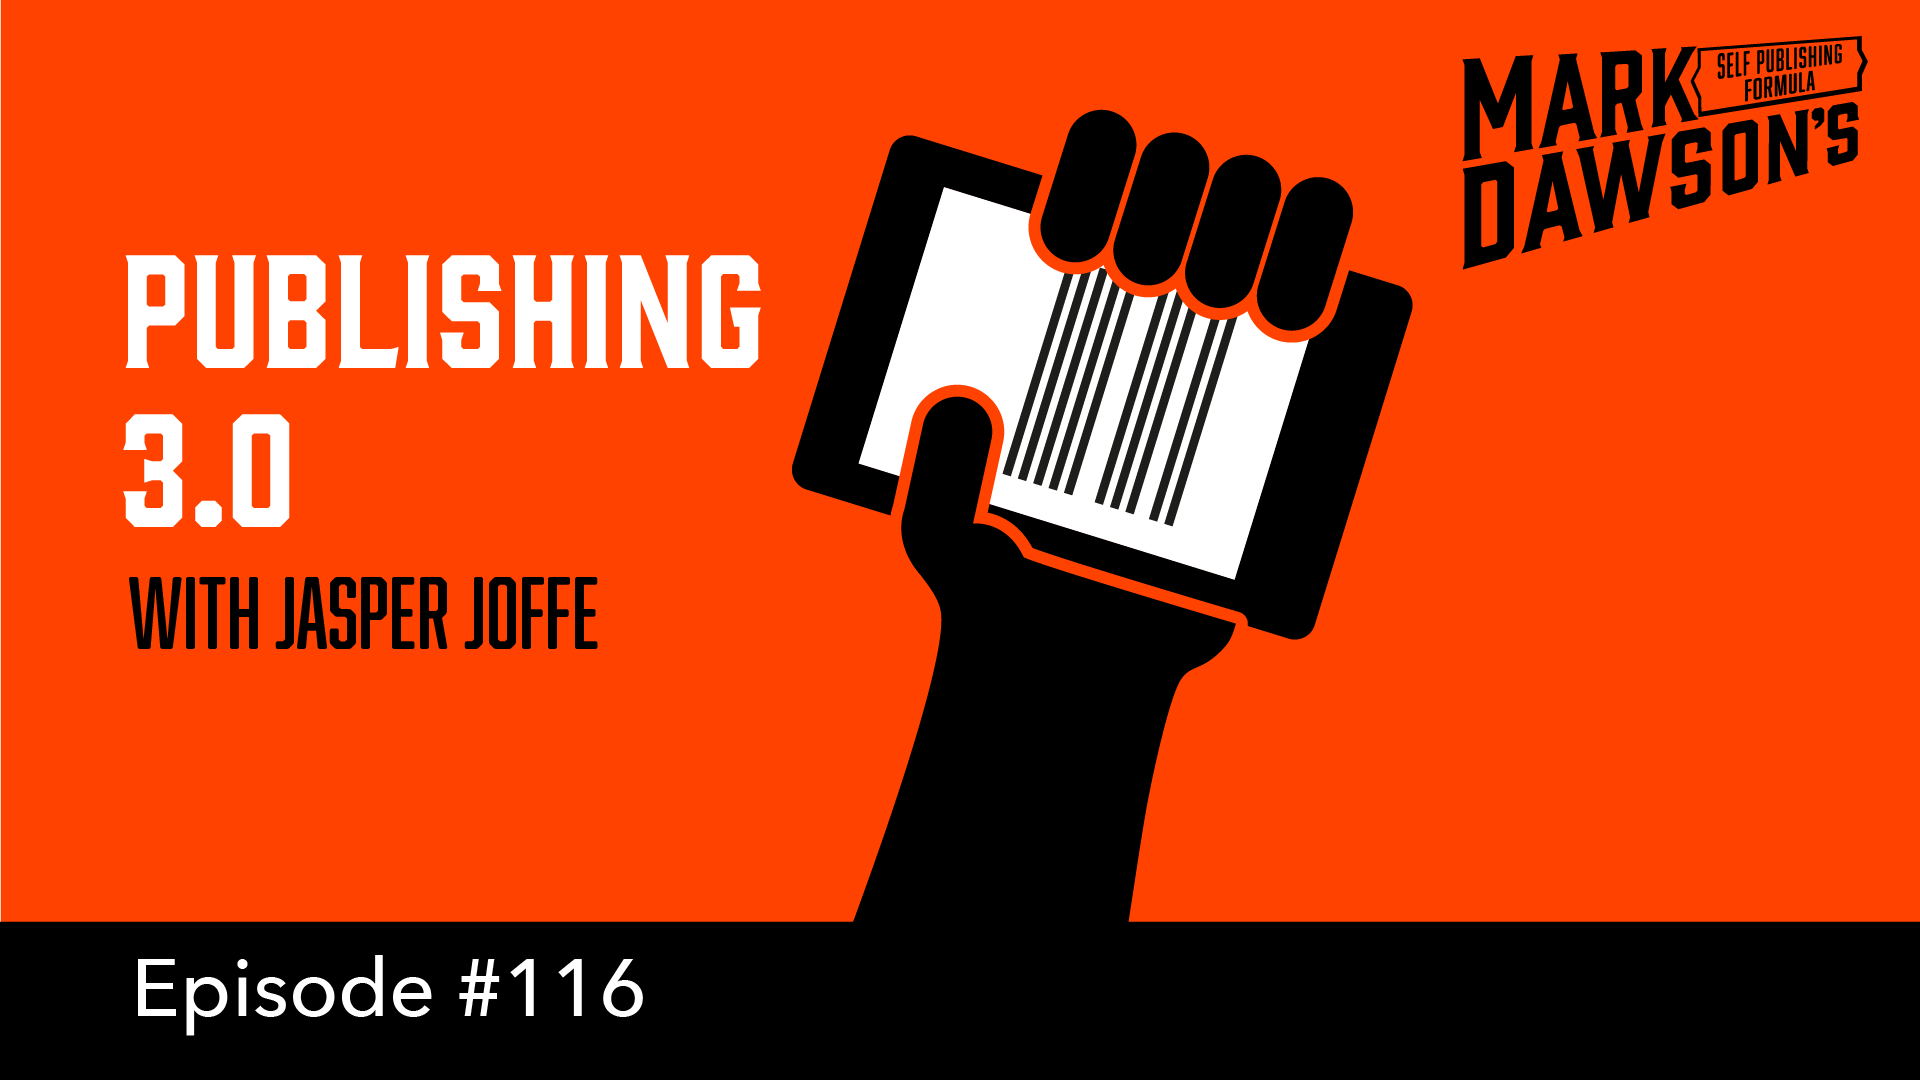 SPF-116: Publishing 3.0 – with Jasper Joffe